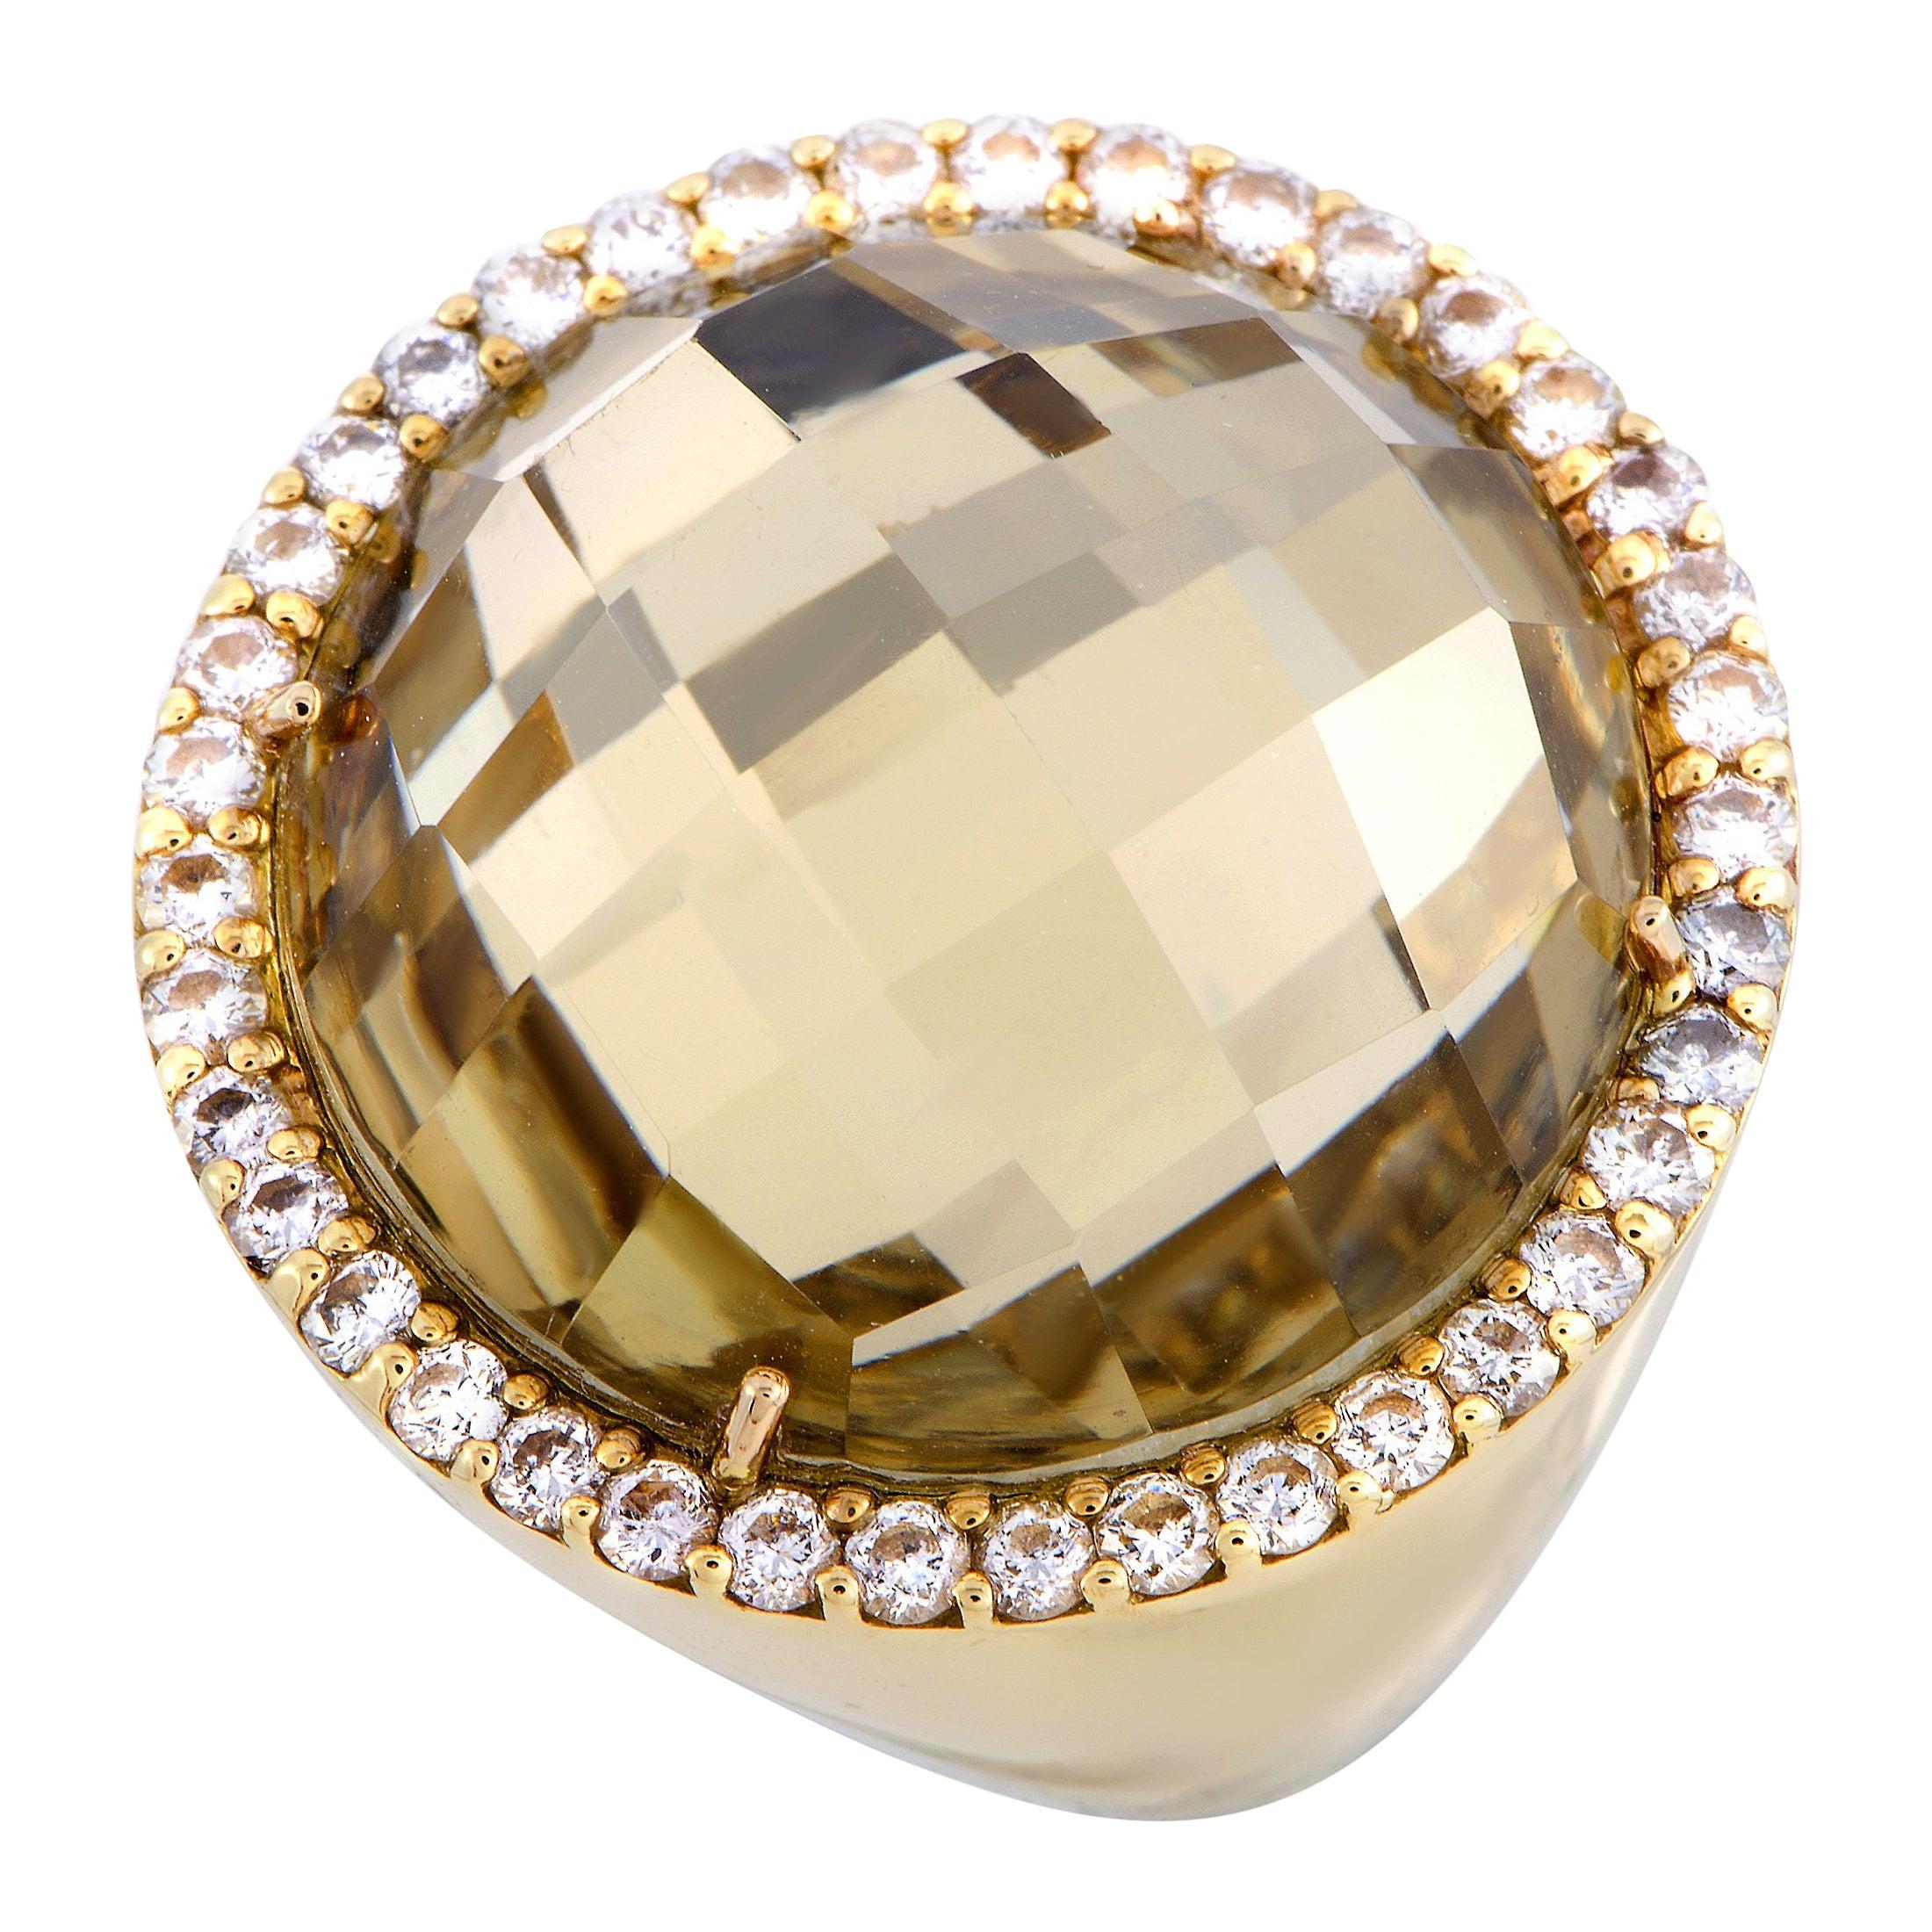 Roberto Coin 18 Karat Yellow Gold Diamond and Rutilated Quartz Ring